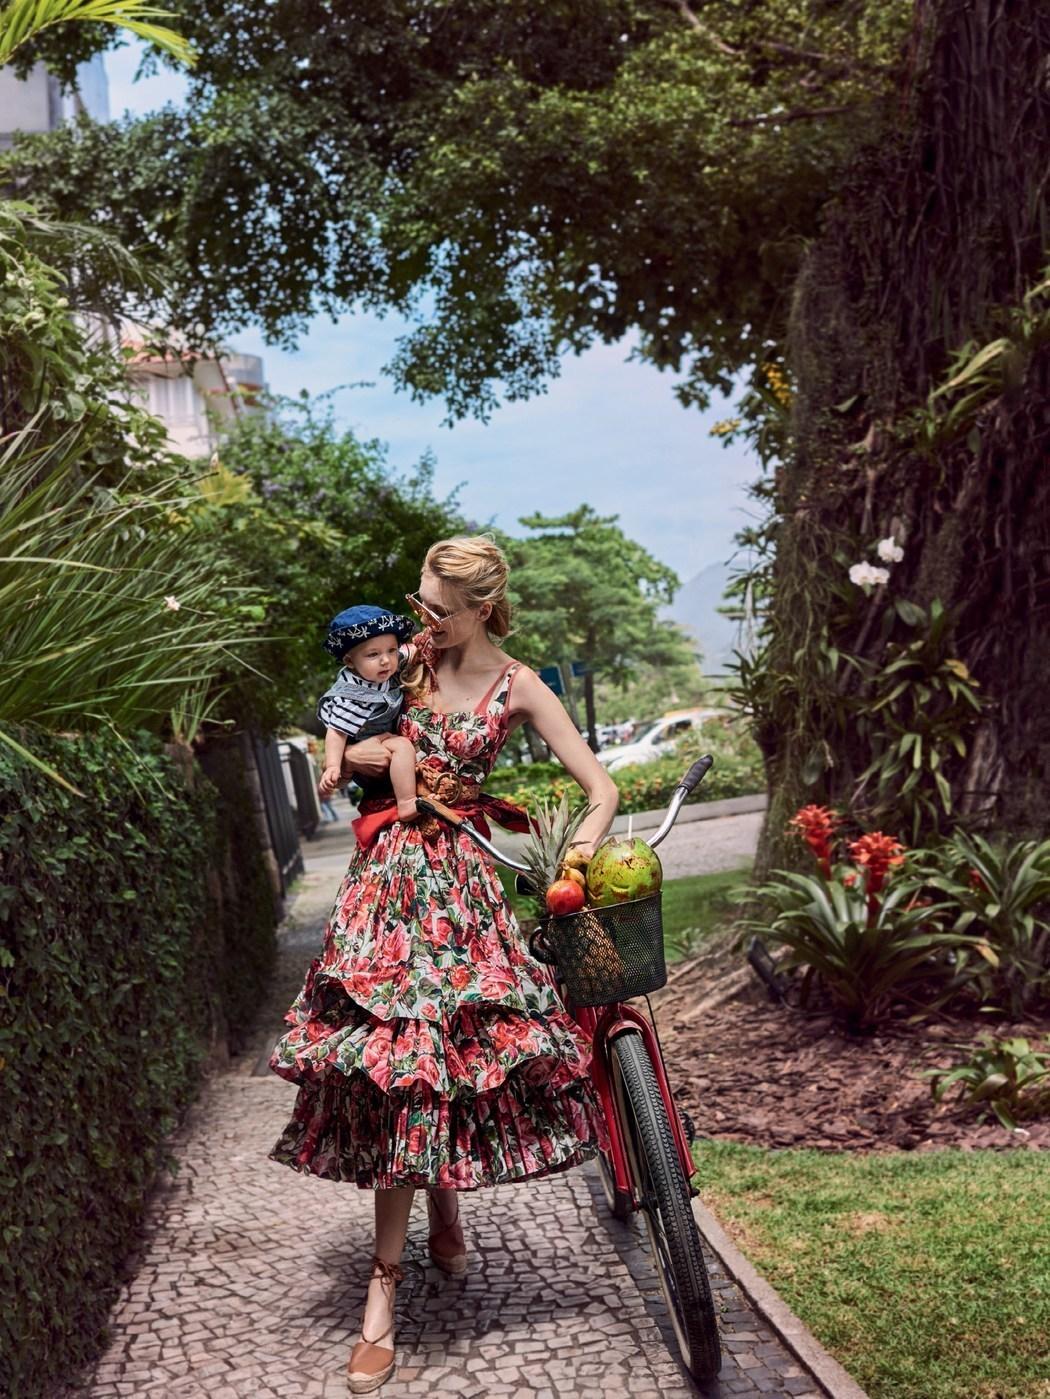 платье, Dolce & Gabbana; пояс, B-Low; шарф, Charvet scarf; эспадрильи,  Soludos